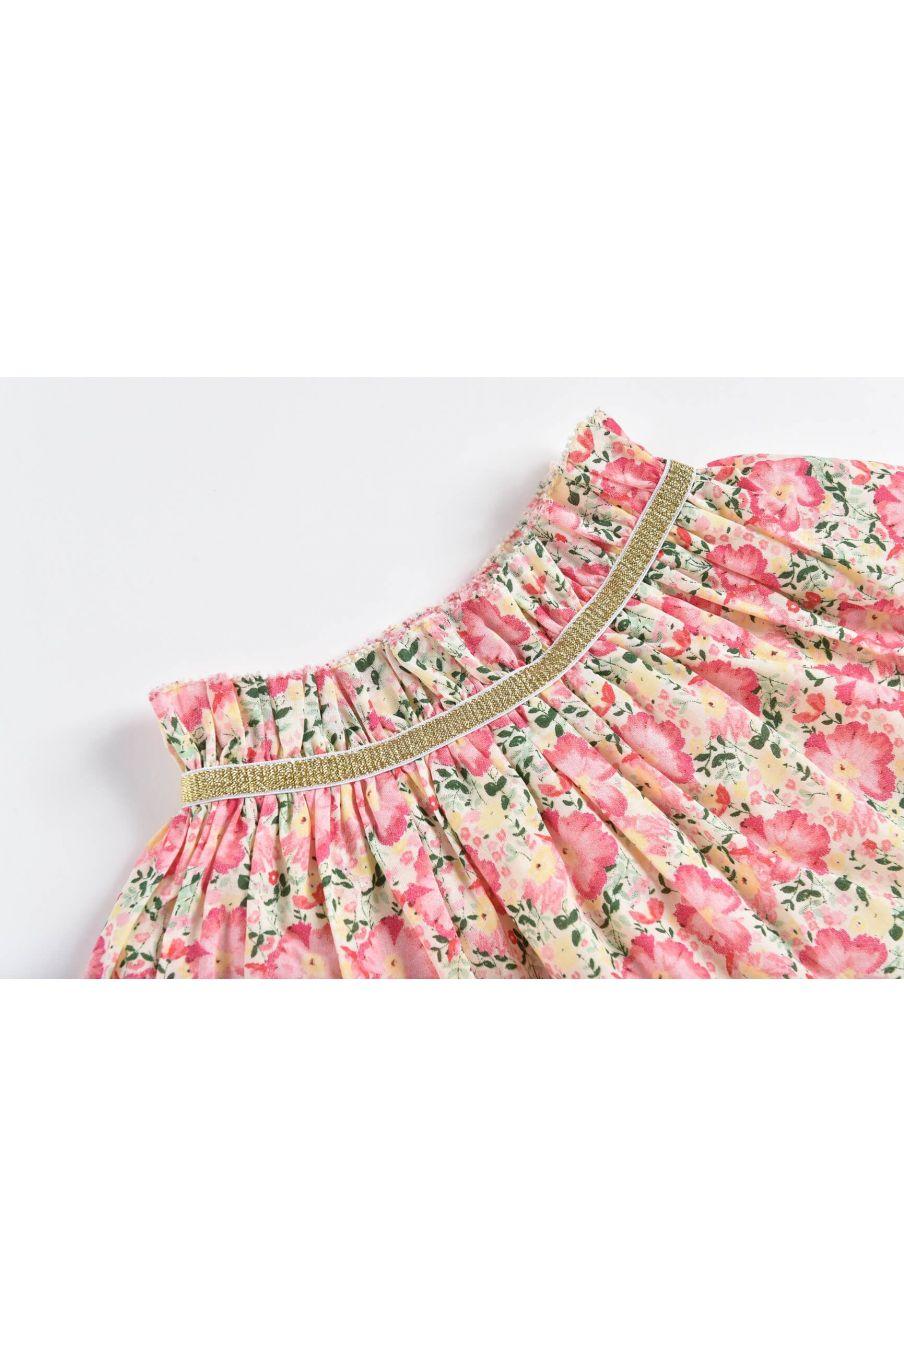 boheme chic vintage jupe bébé fille salina pink meadow